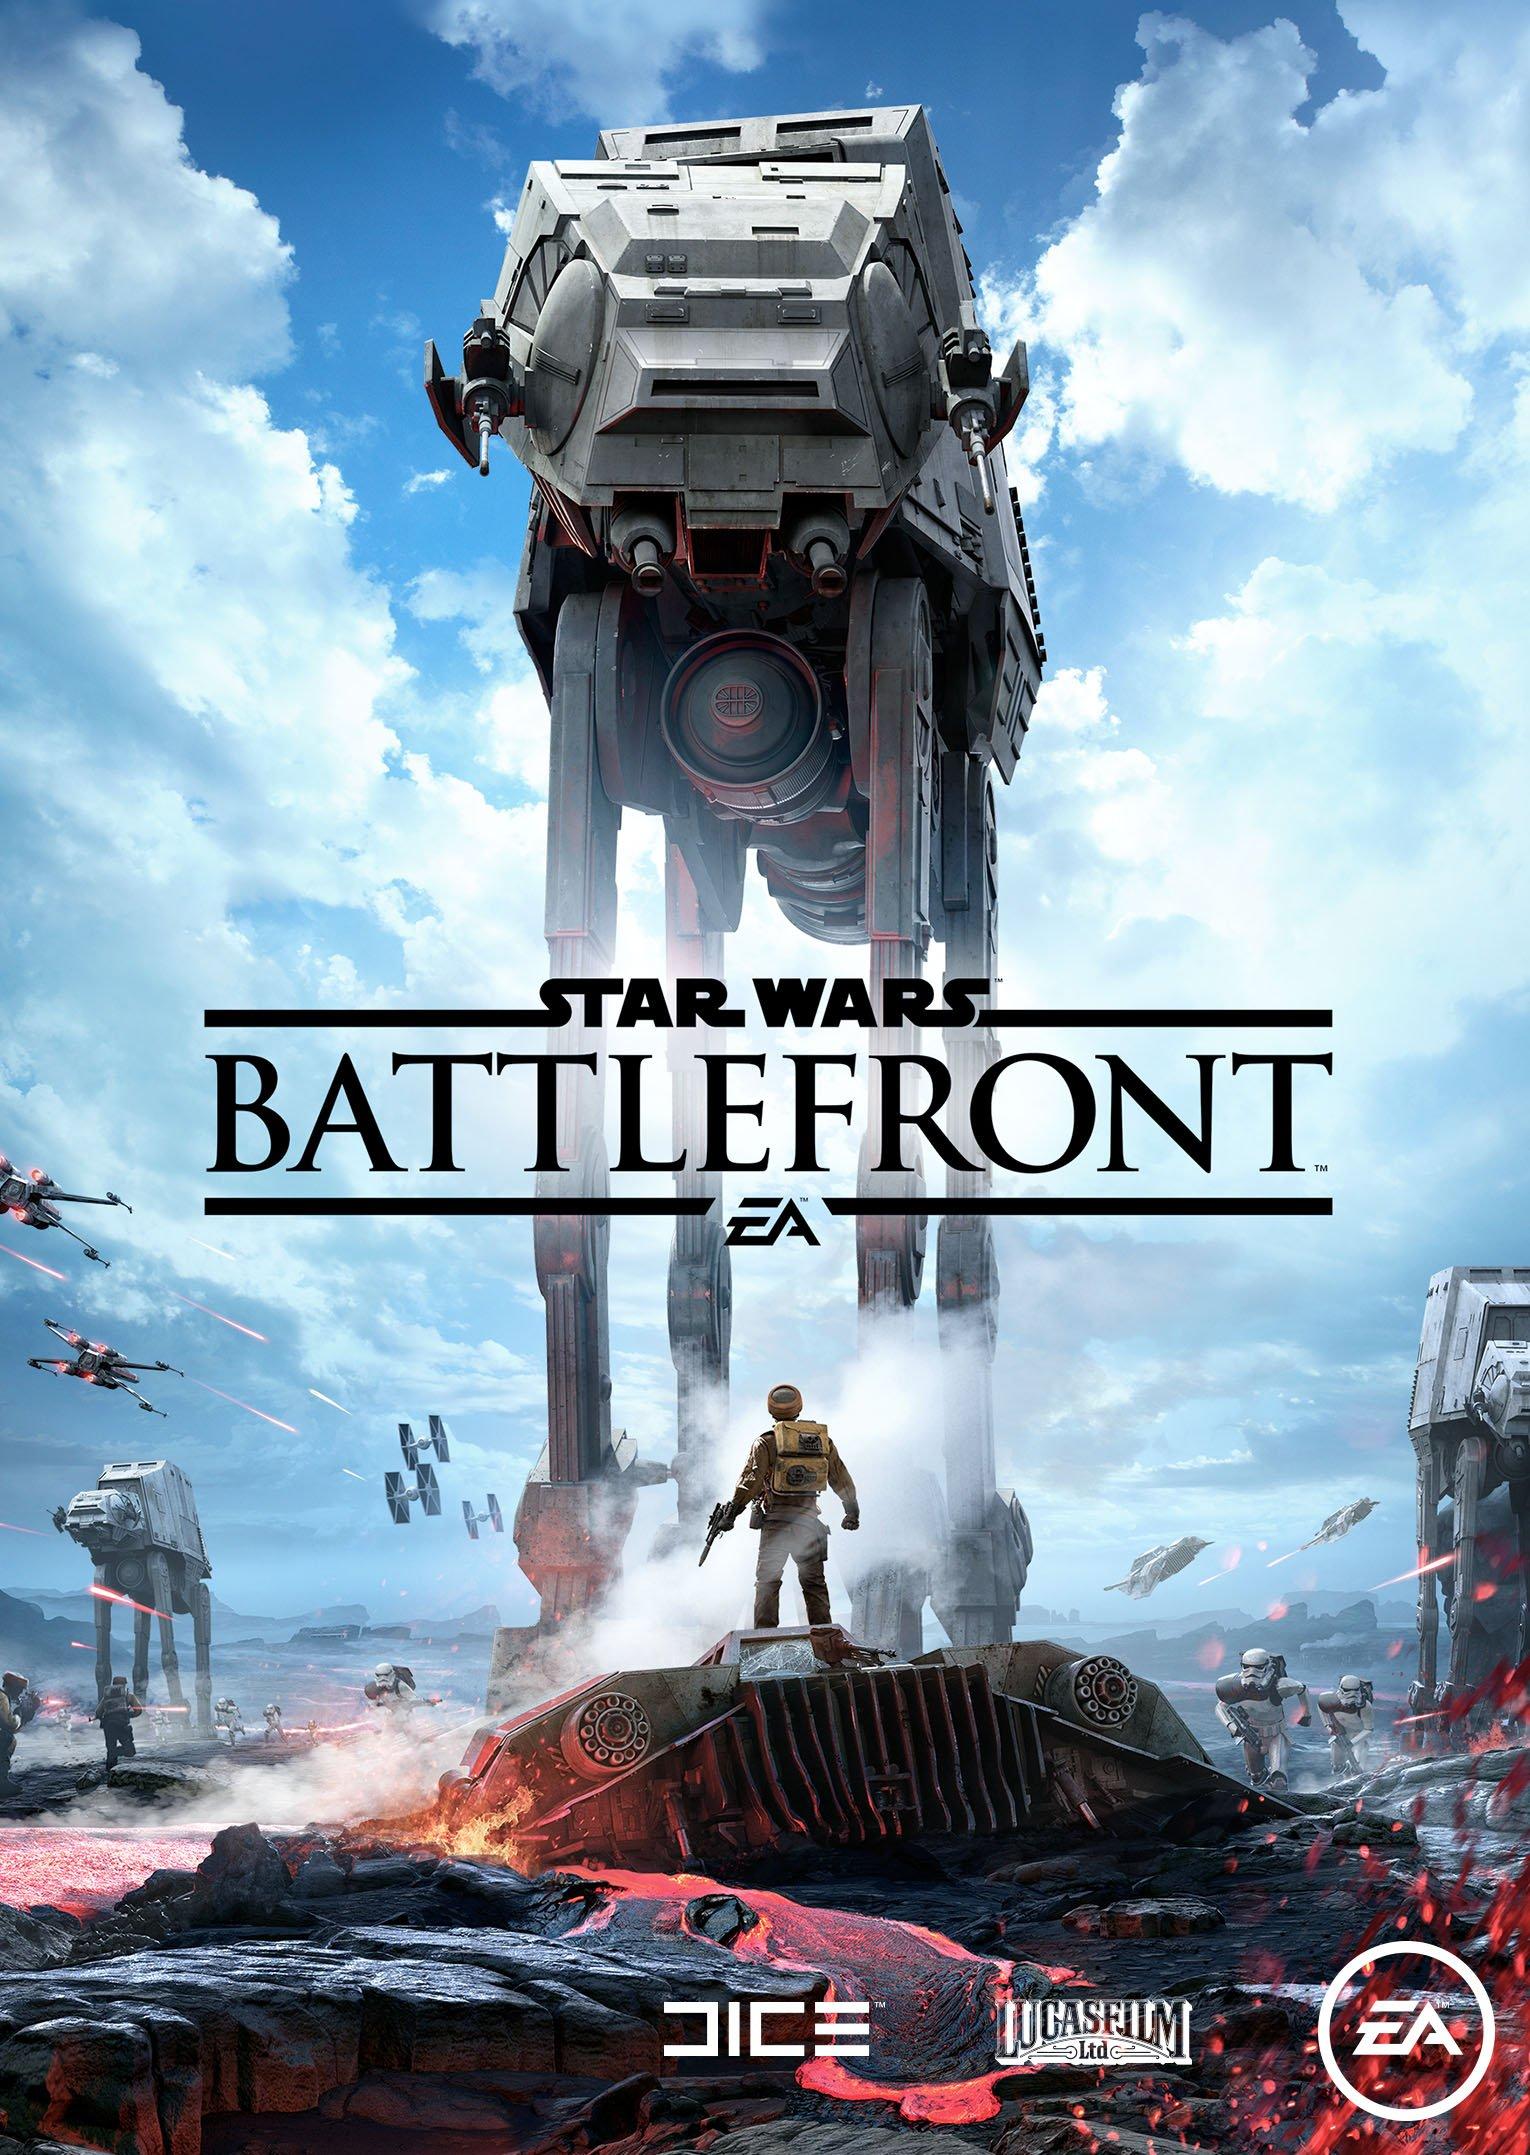 Star Wars Battlefront | Wookieepedia | FANDOM powered by Wikia